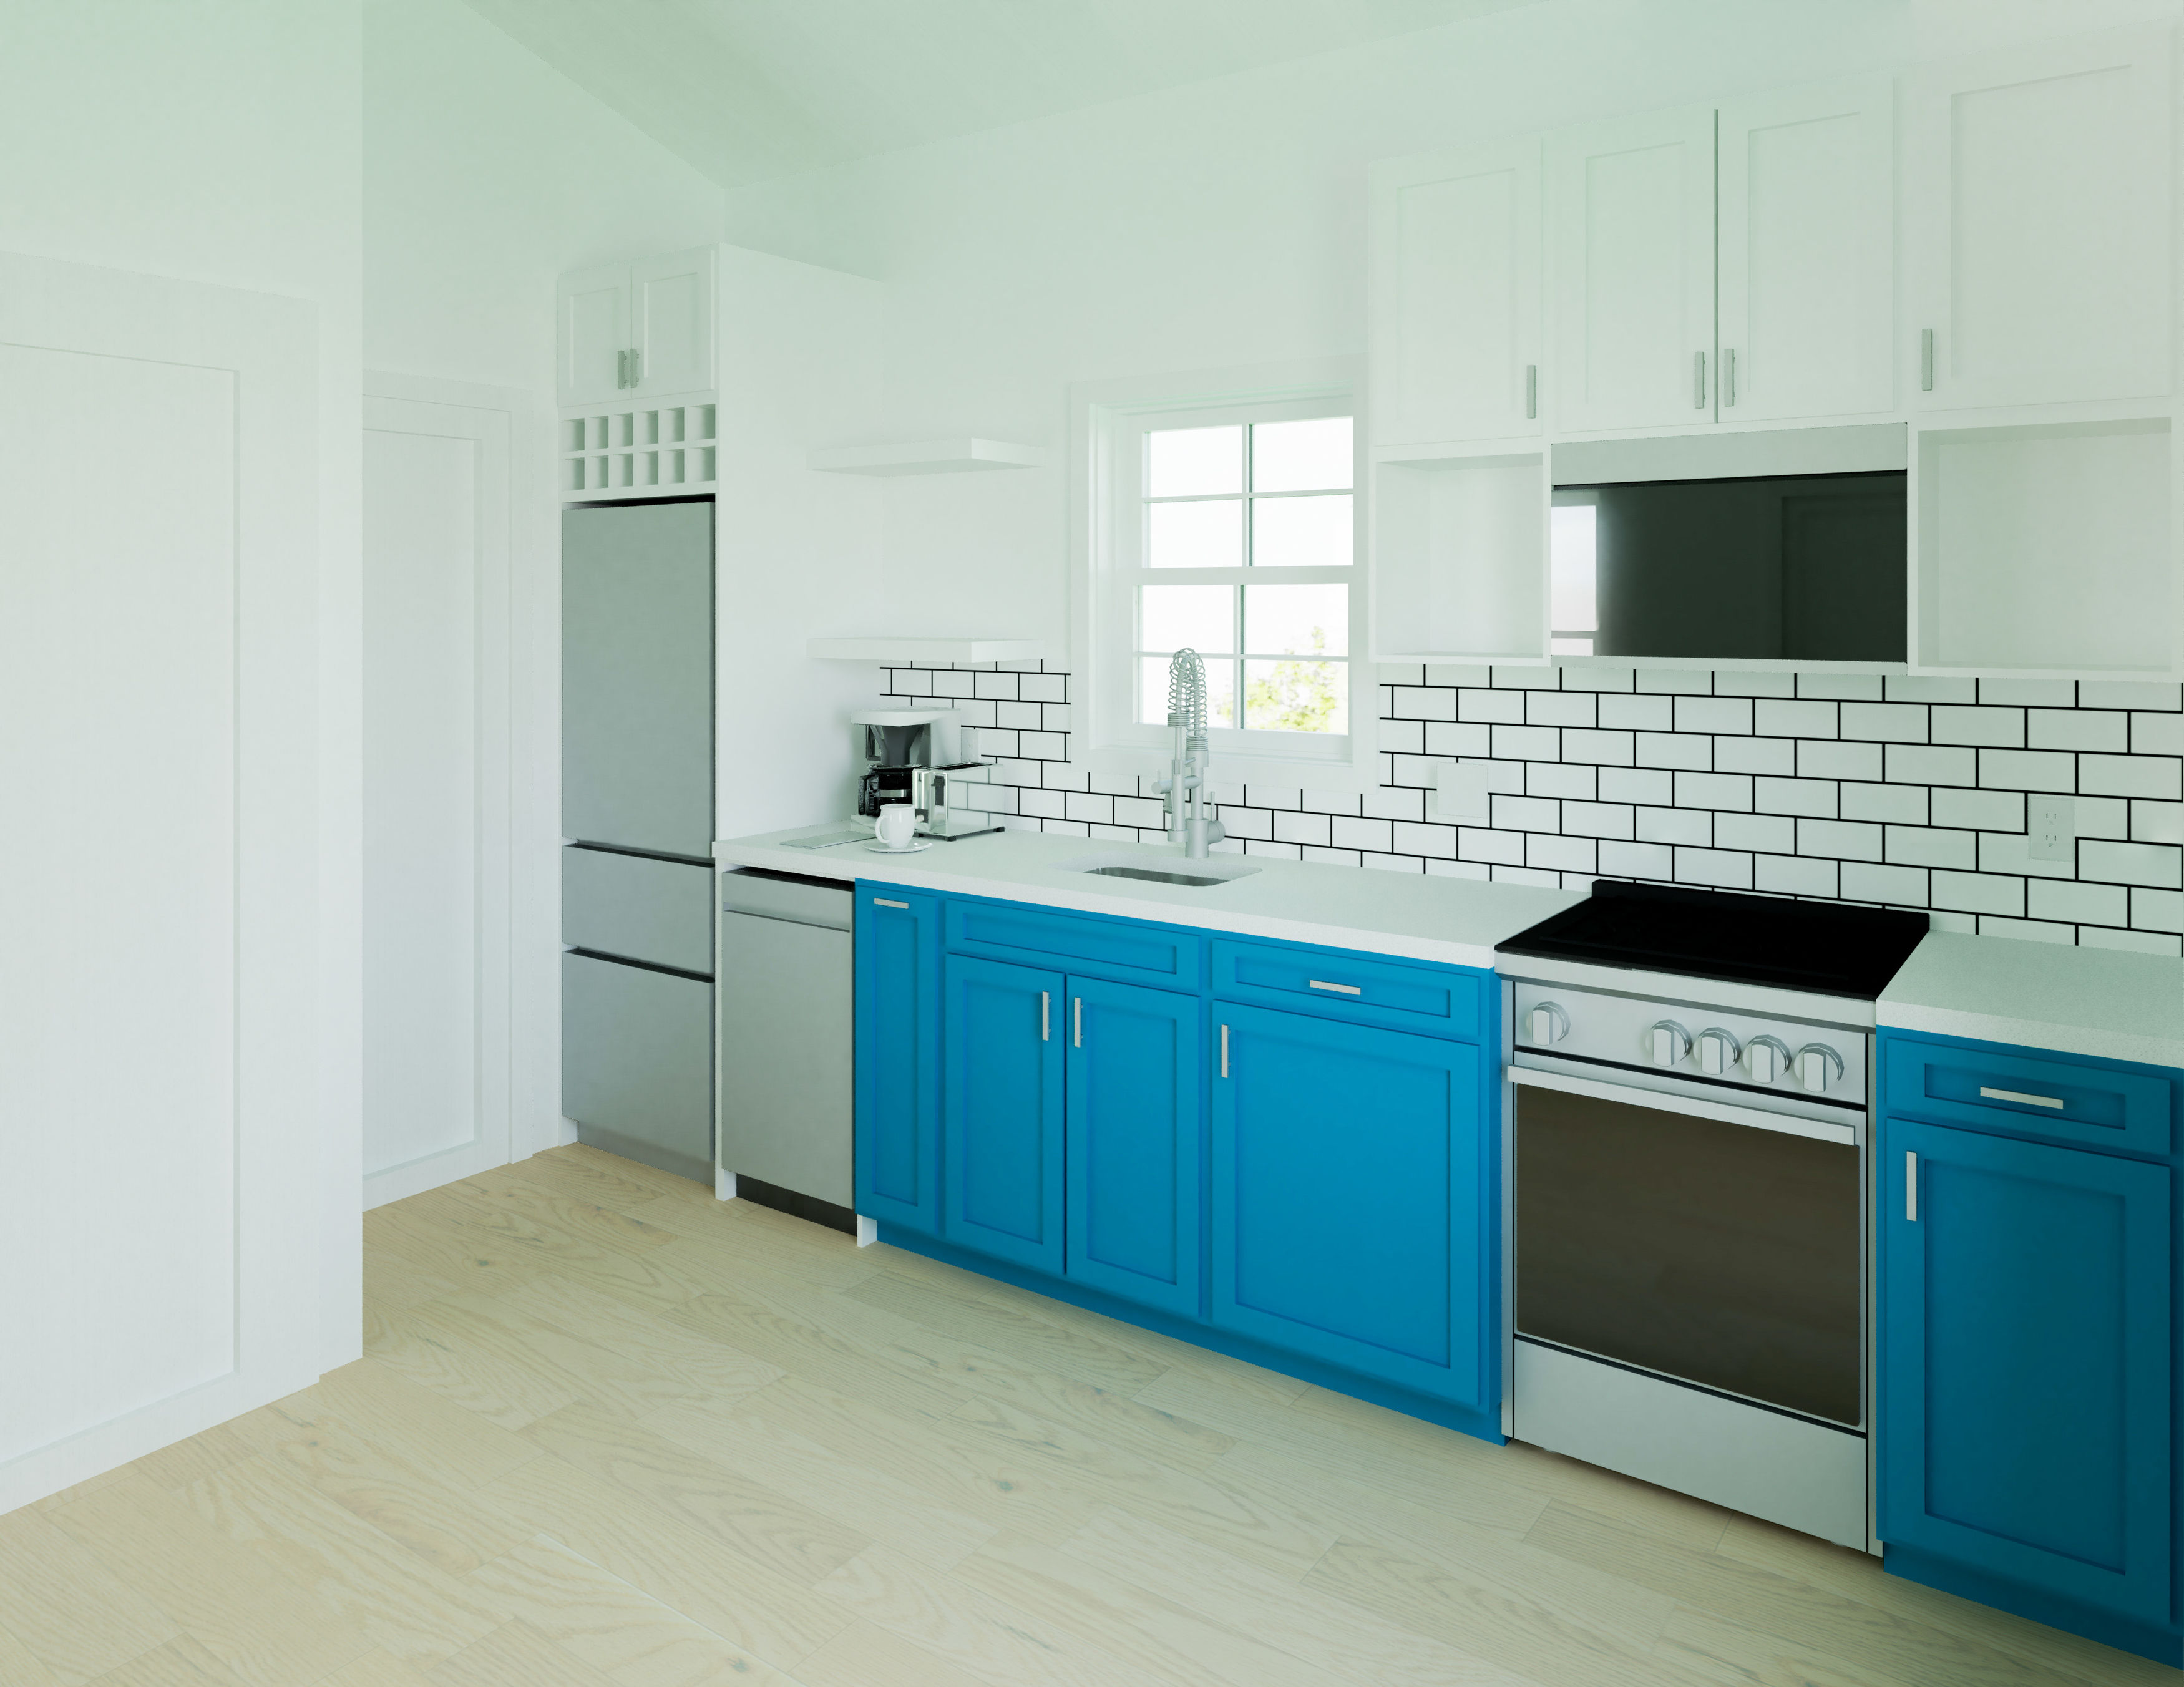 2246-elmgrove-kitchen-rendering-4-edited-3500-3500